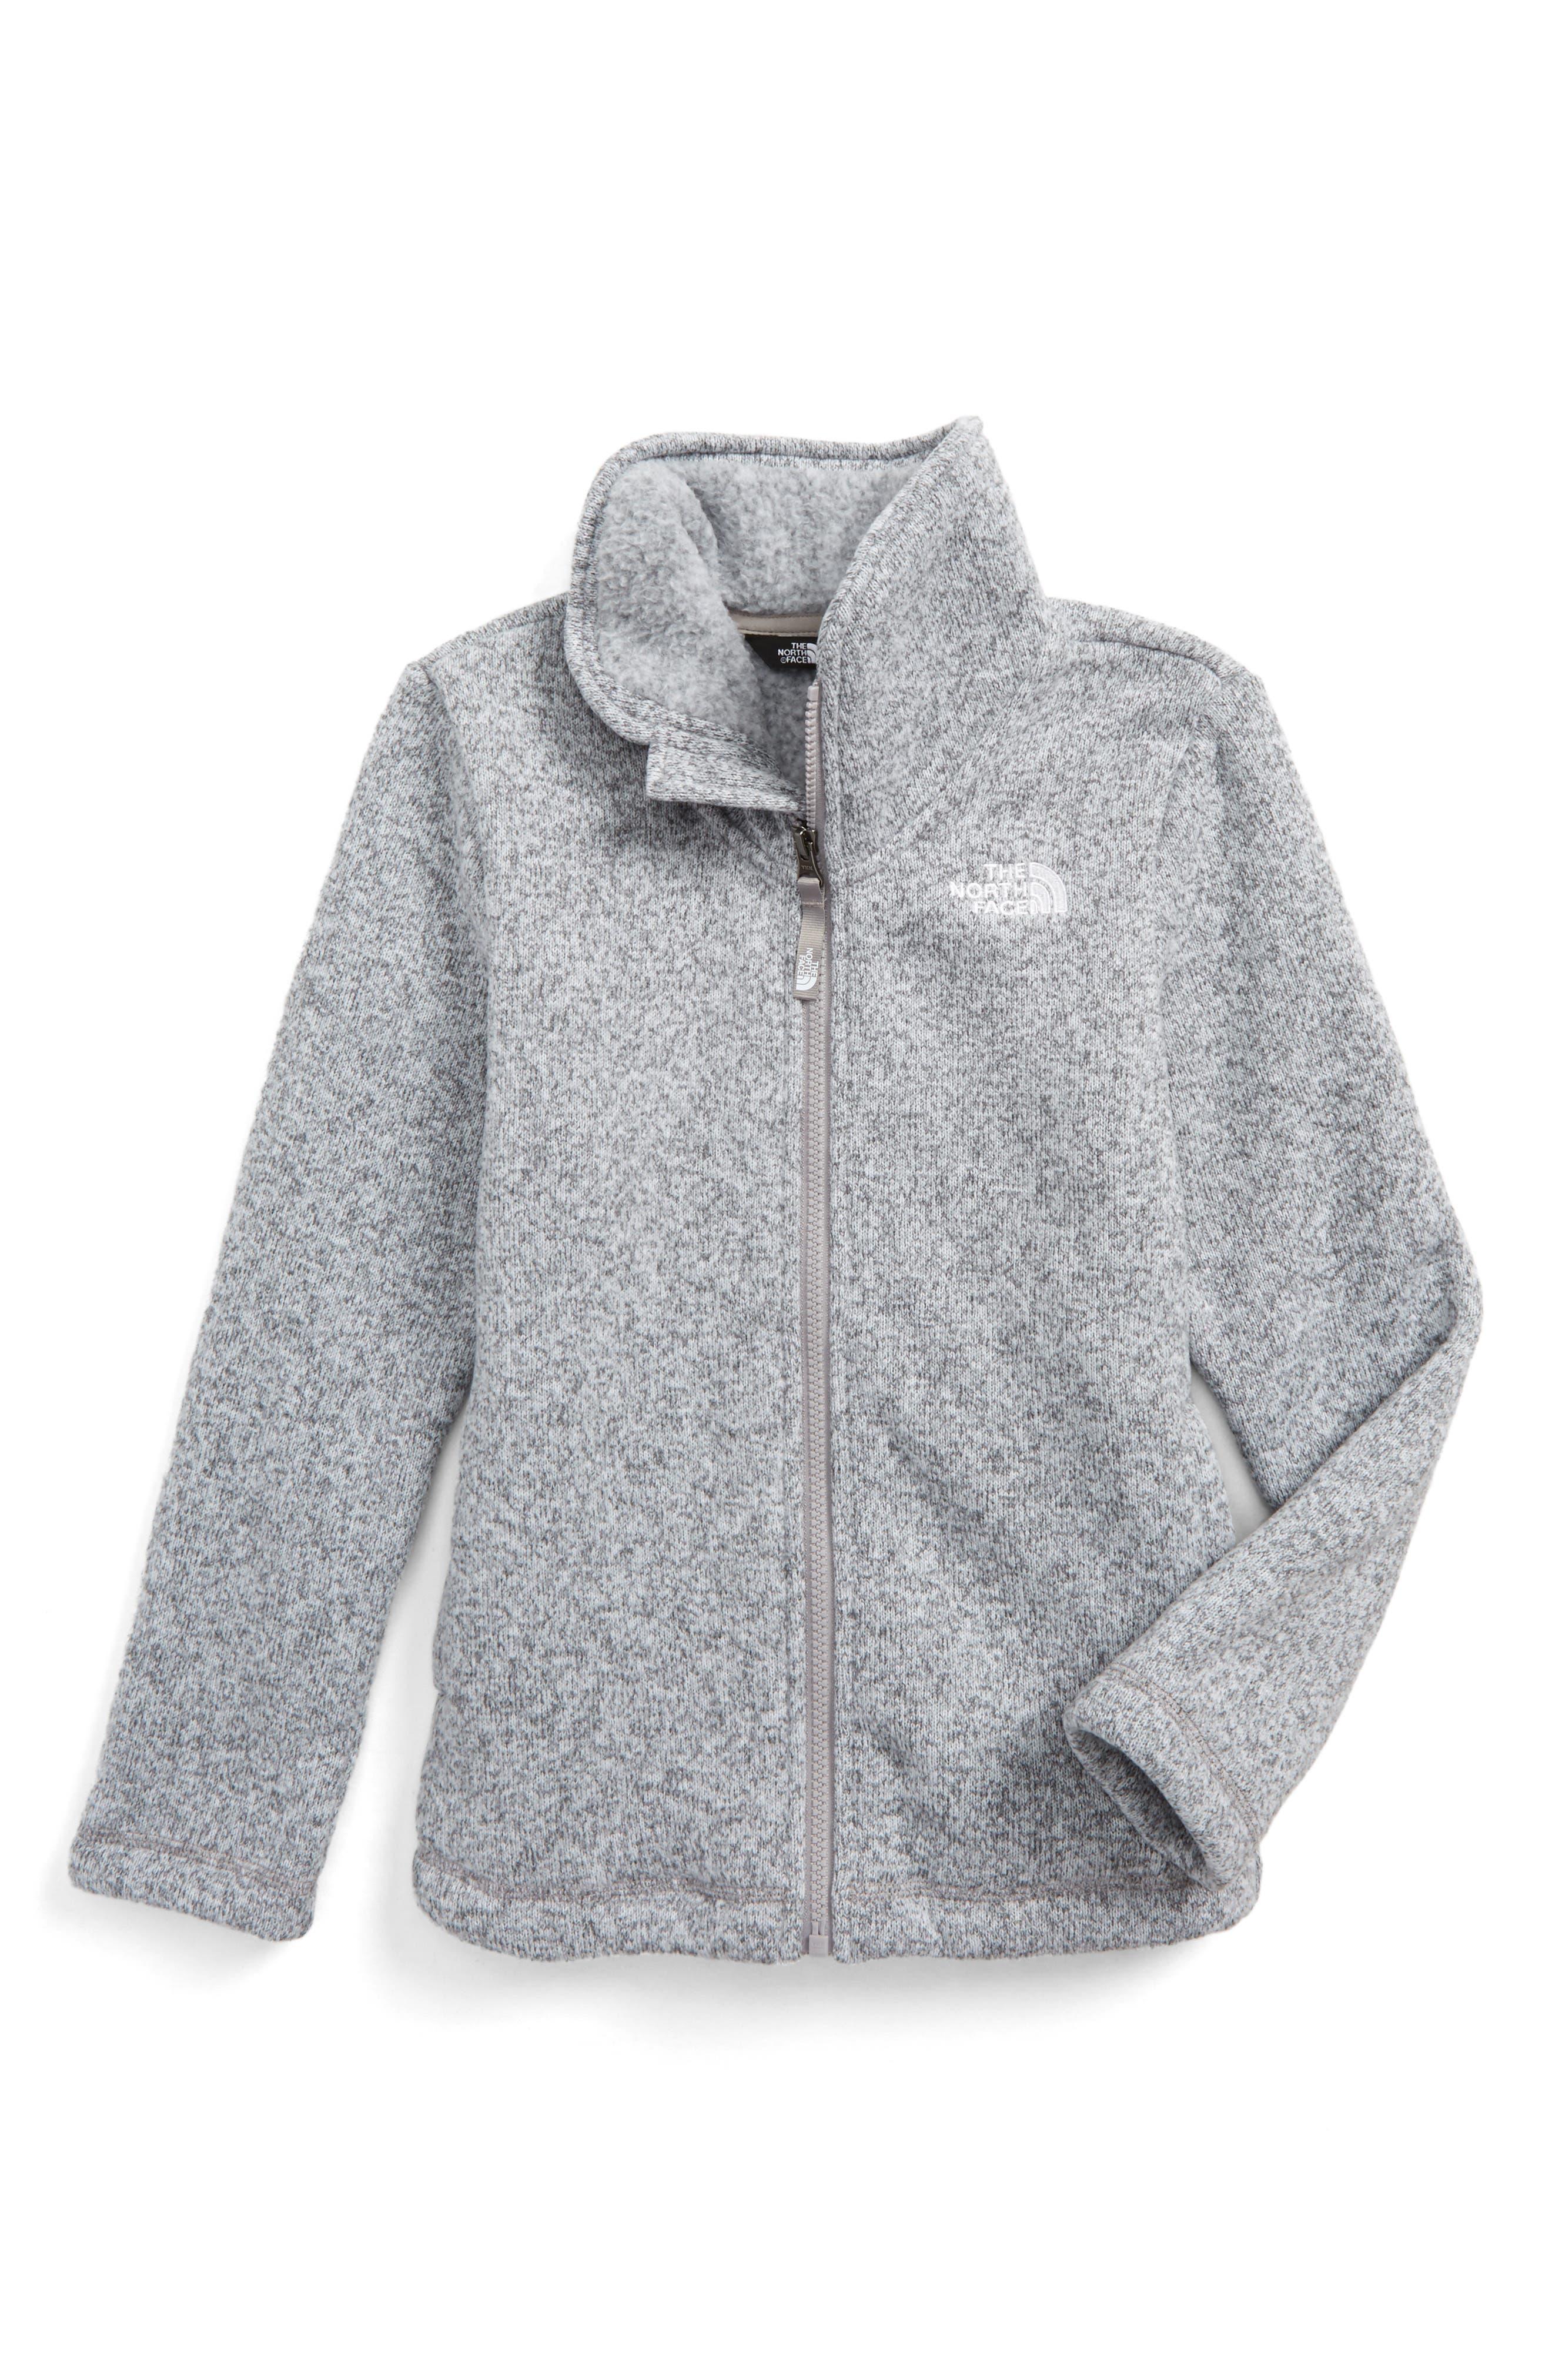 Crescent Fleece Jacket,                             Main thumbnail 1, color,                             050